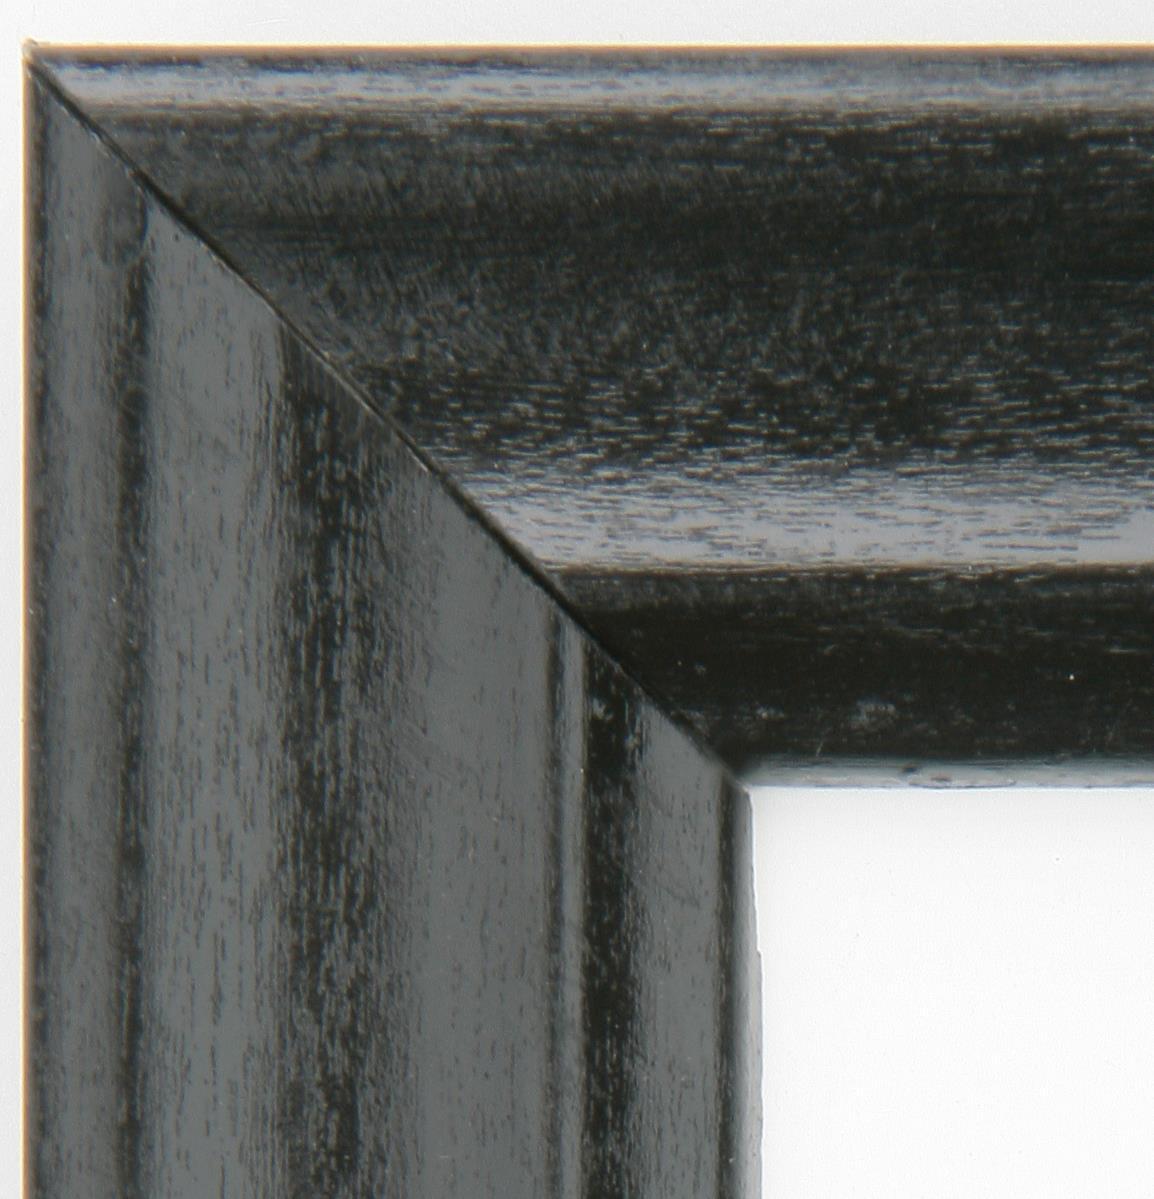 7105004656199 Frame, Black, Wood, 10x12 - shopECVC.com